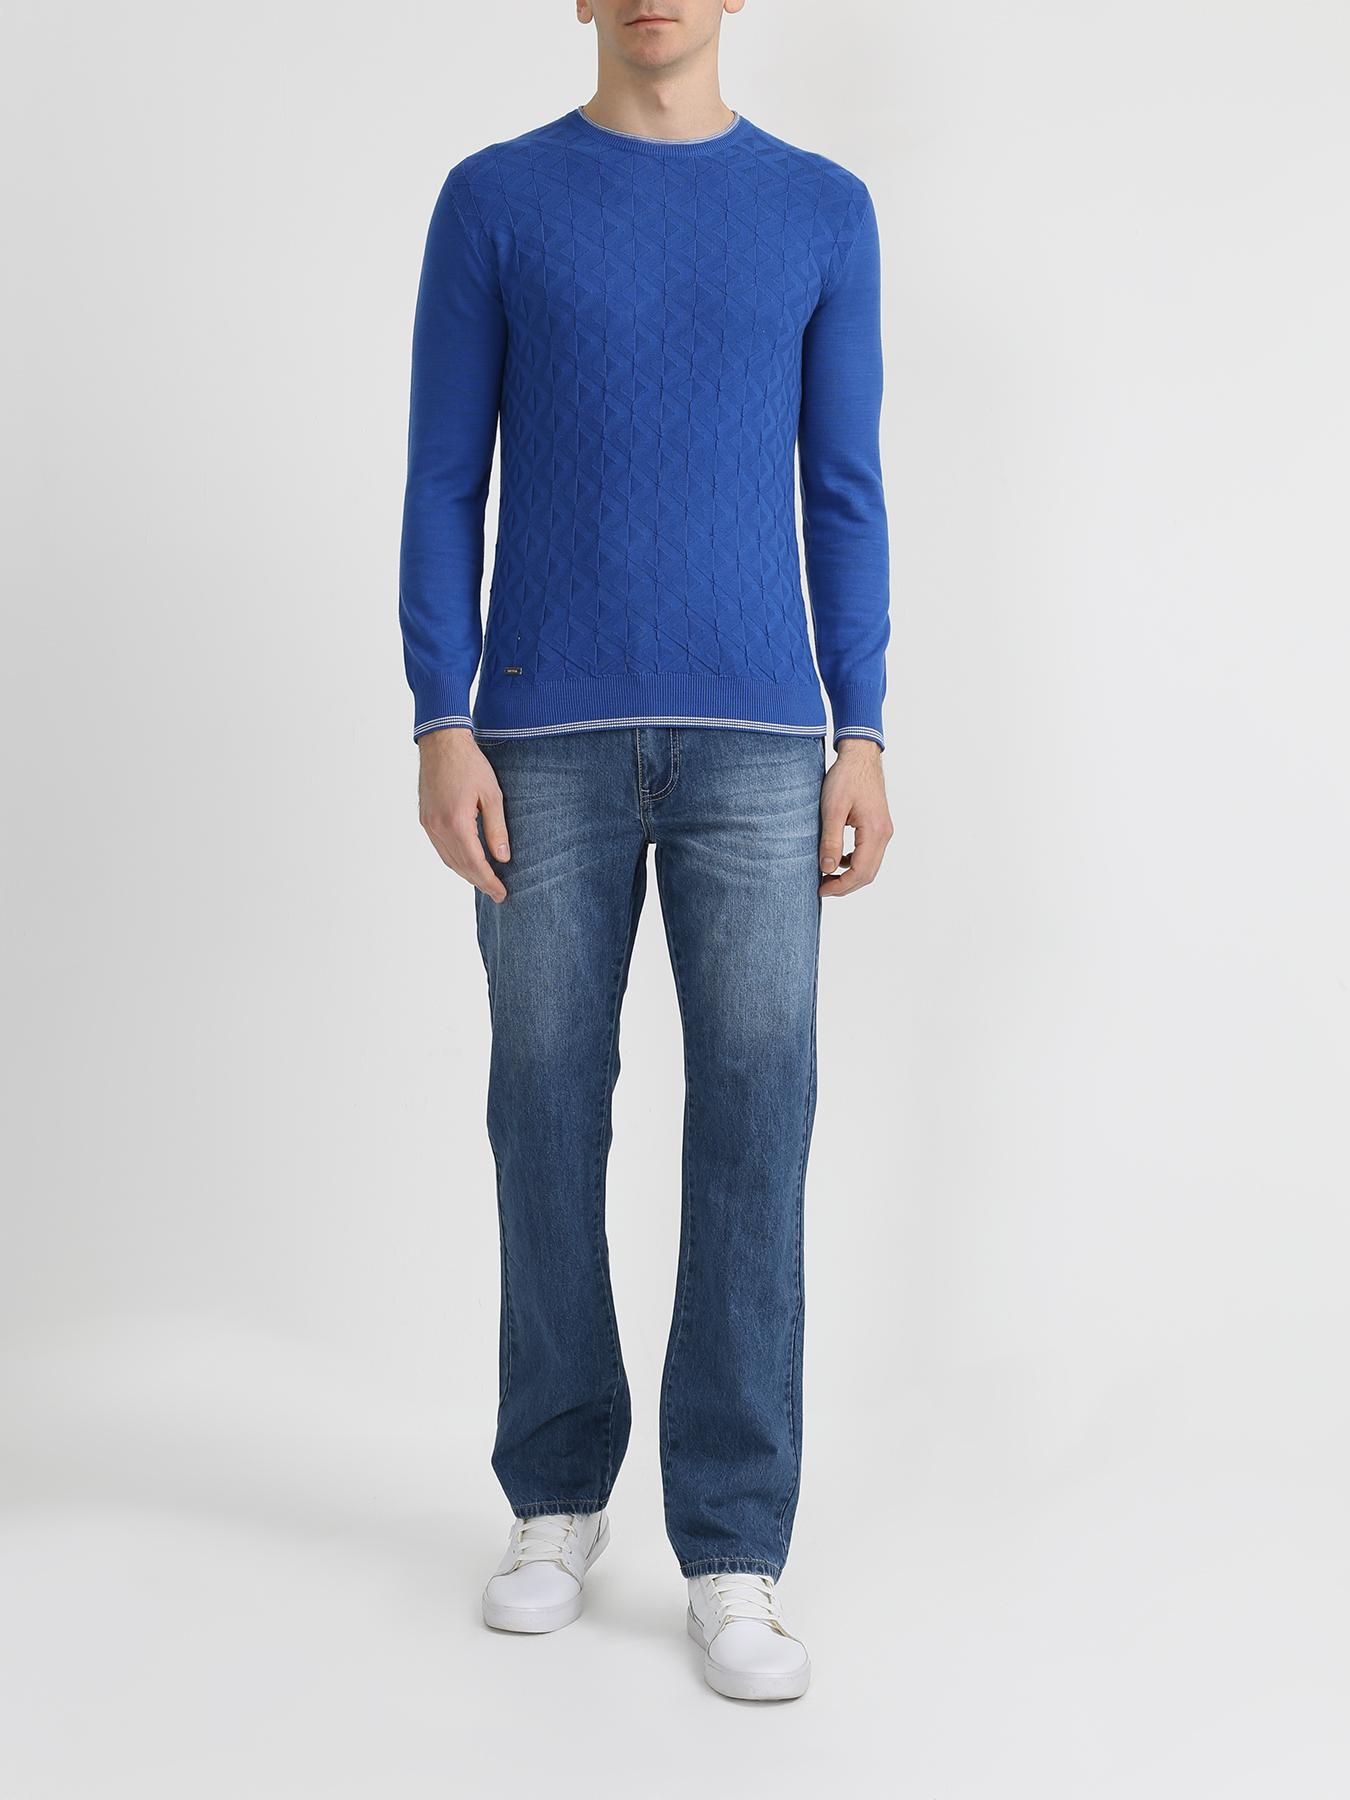 Брюки Ritter Jeans Прямые джинсы брюки rinascimento прямые джинсы